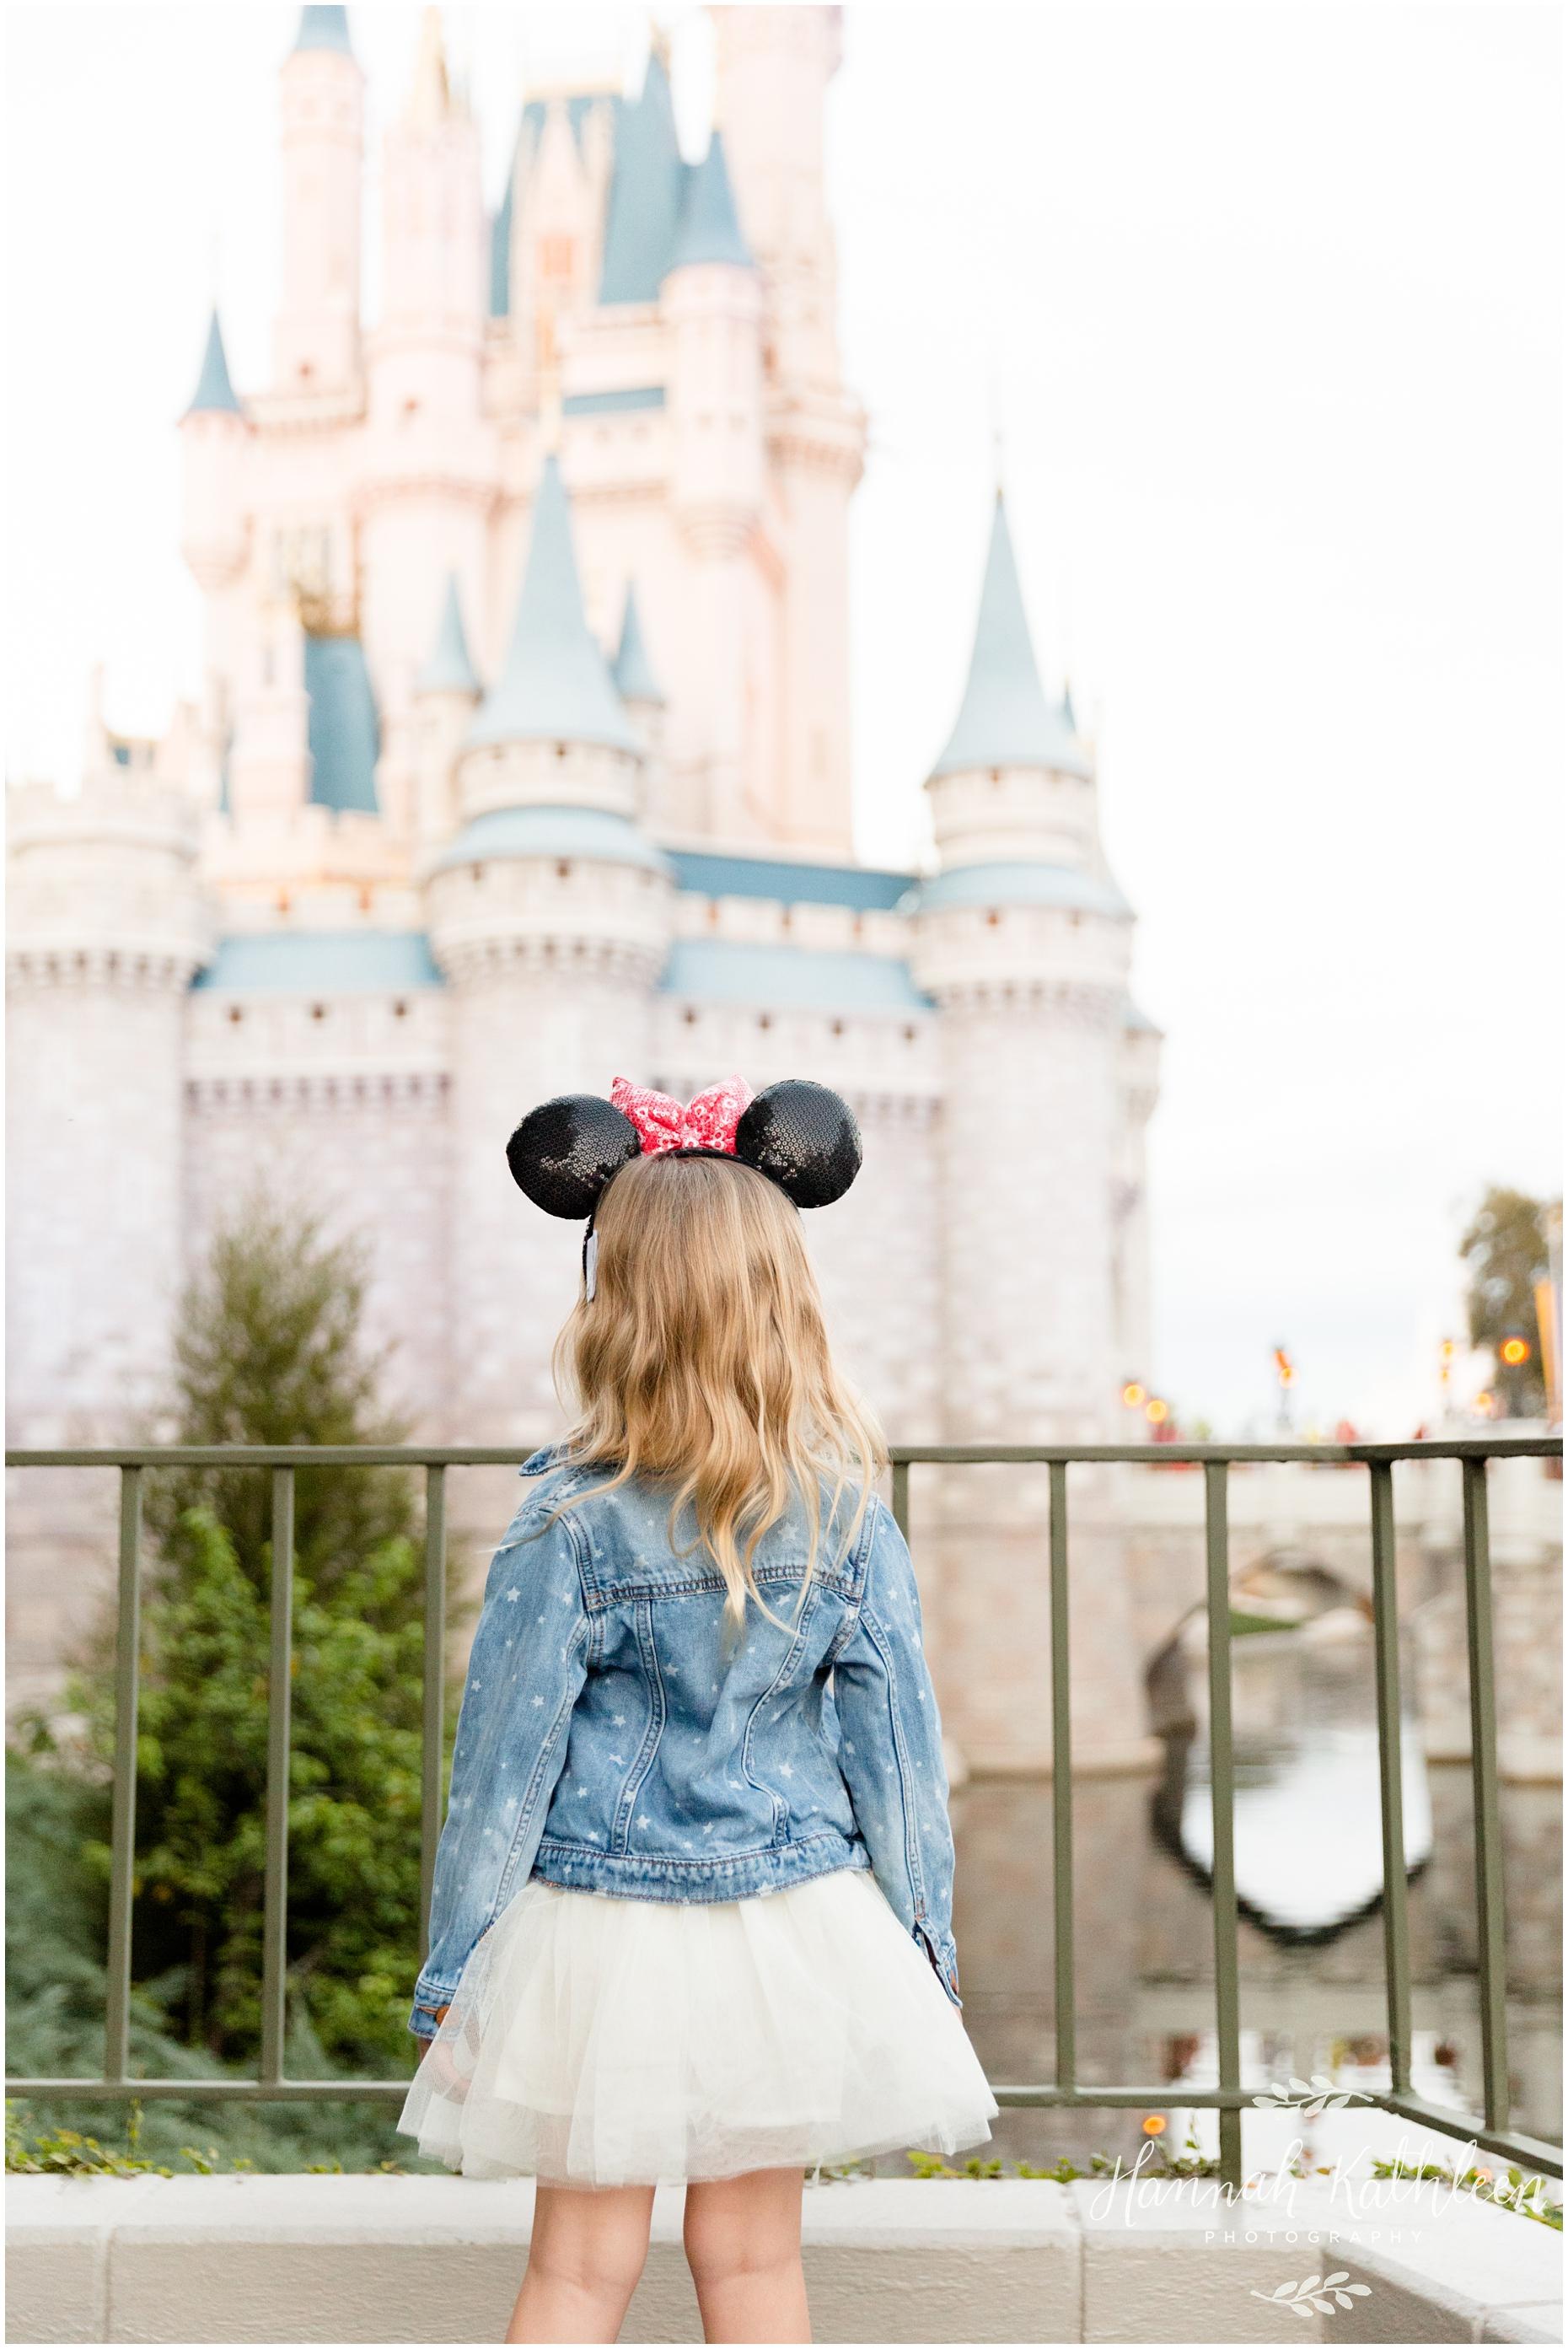 Donahue_Disney_Parks_Magic_Kingdom_Disneyland_Family_Photography